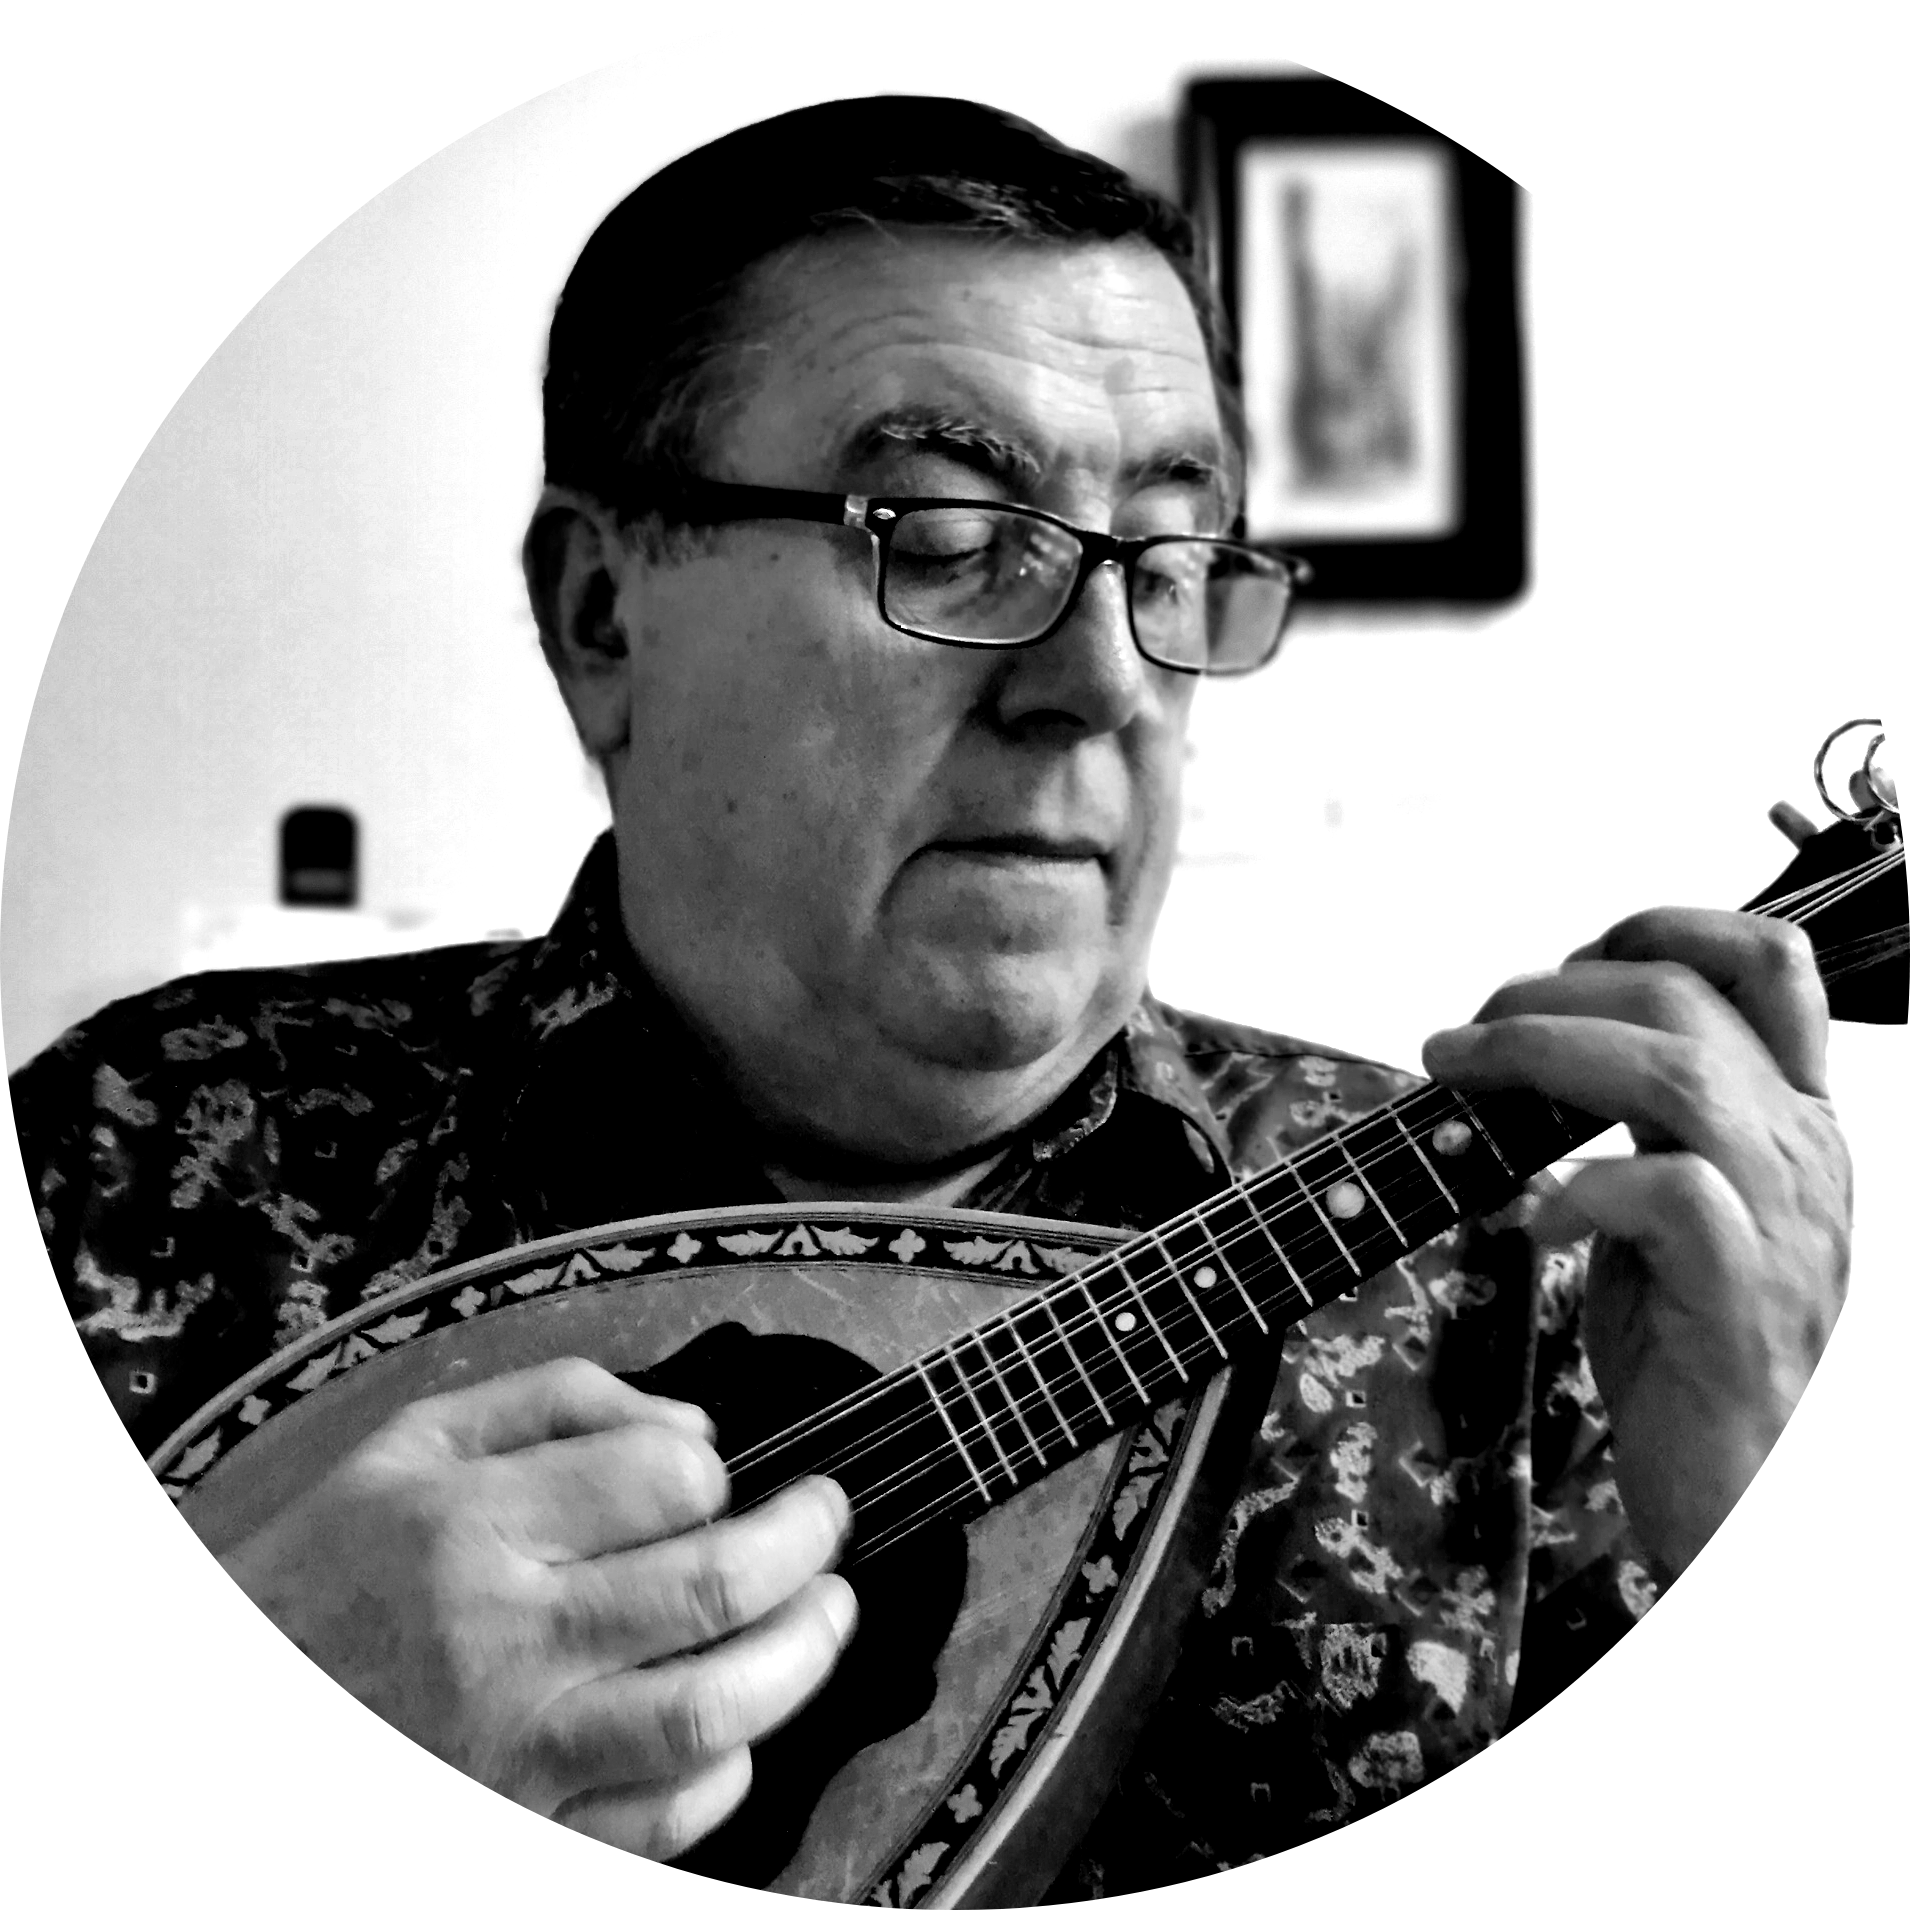 Hugo Escobar Jiménez